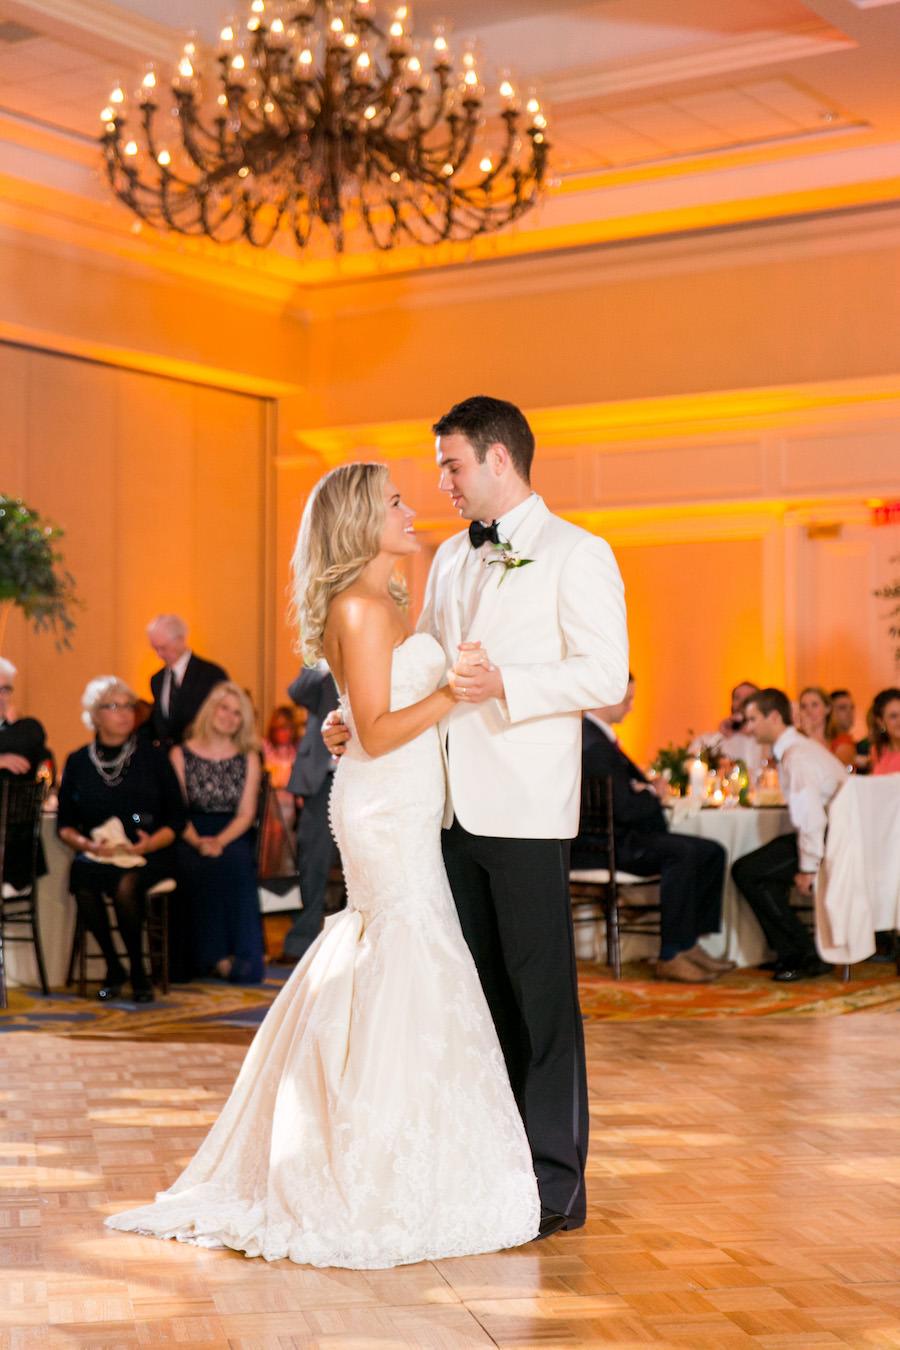 Bride and Groom First Dance at Wedding Reception   Tampa Wedding Venue Tampa Marriott Waterside